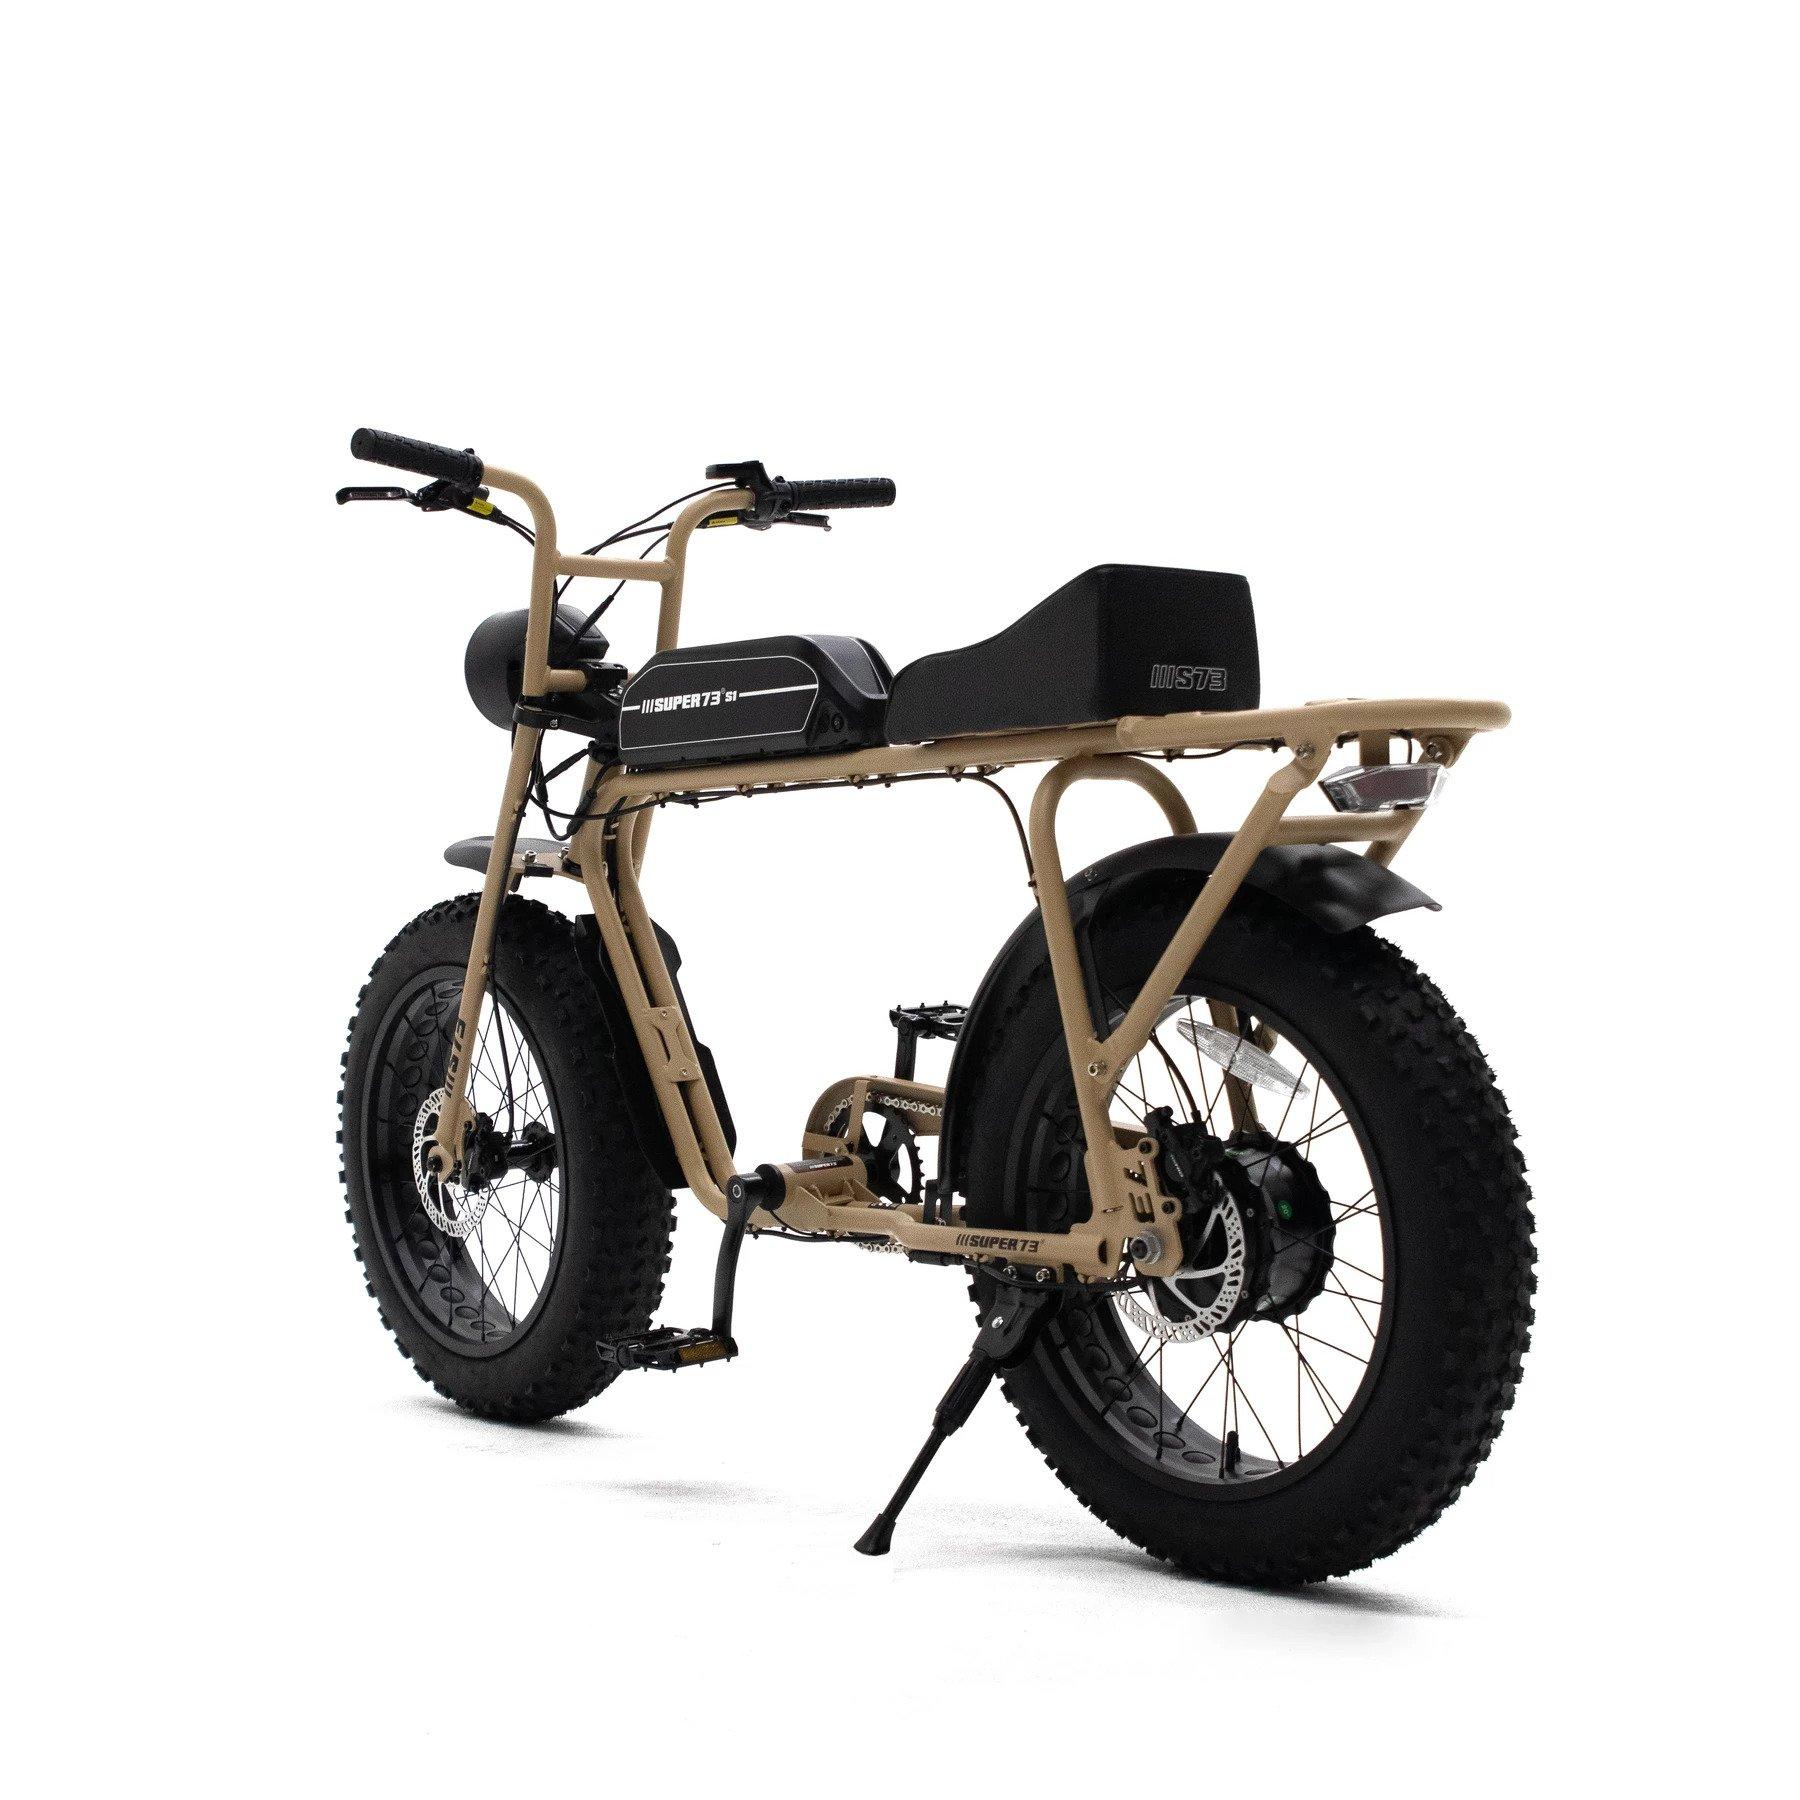 SUPER73-S1 Tan Electric Bike | Buy the Best Electric Bikes ...